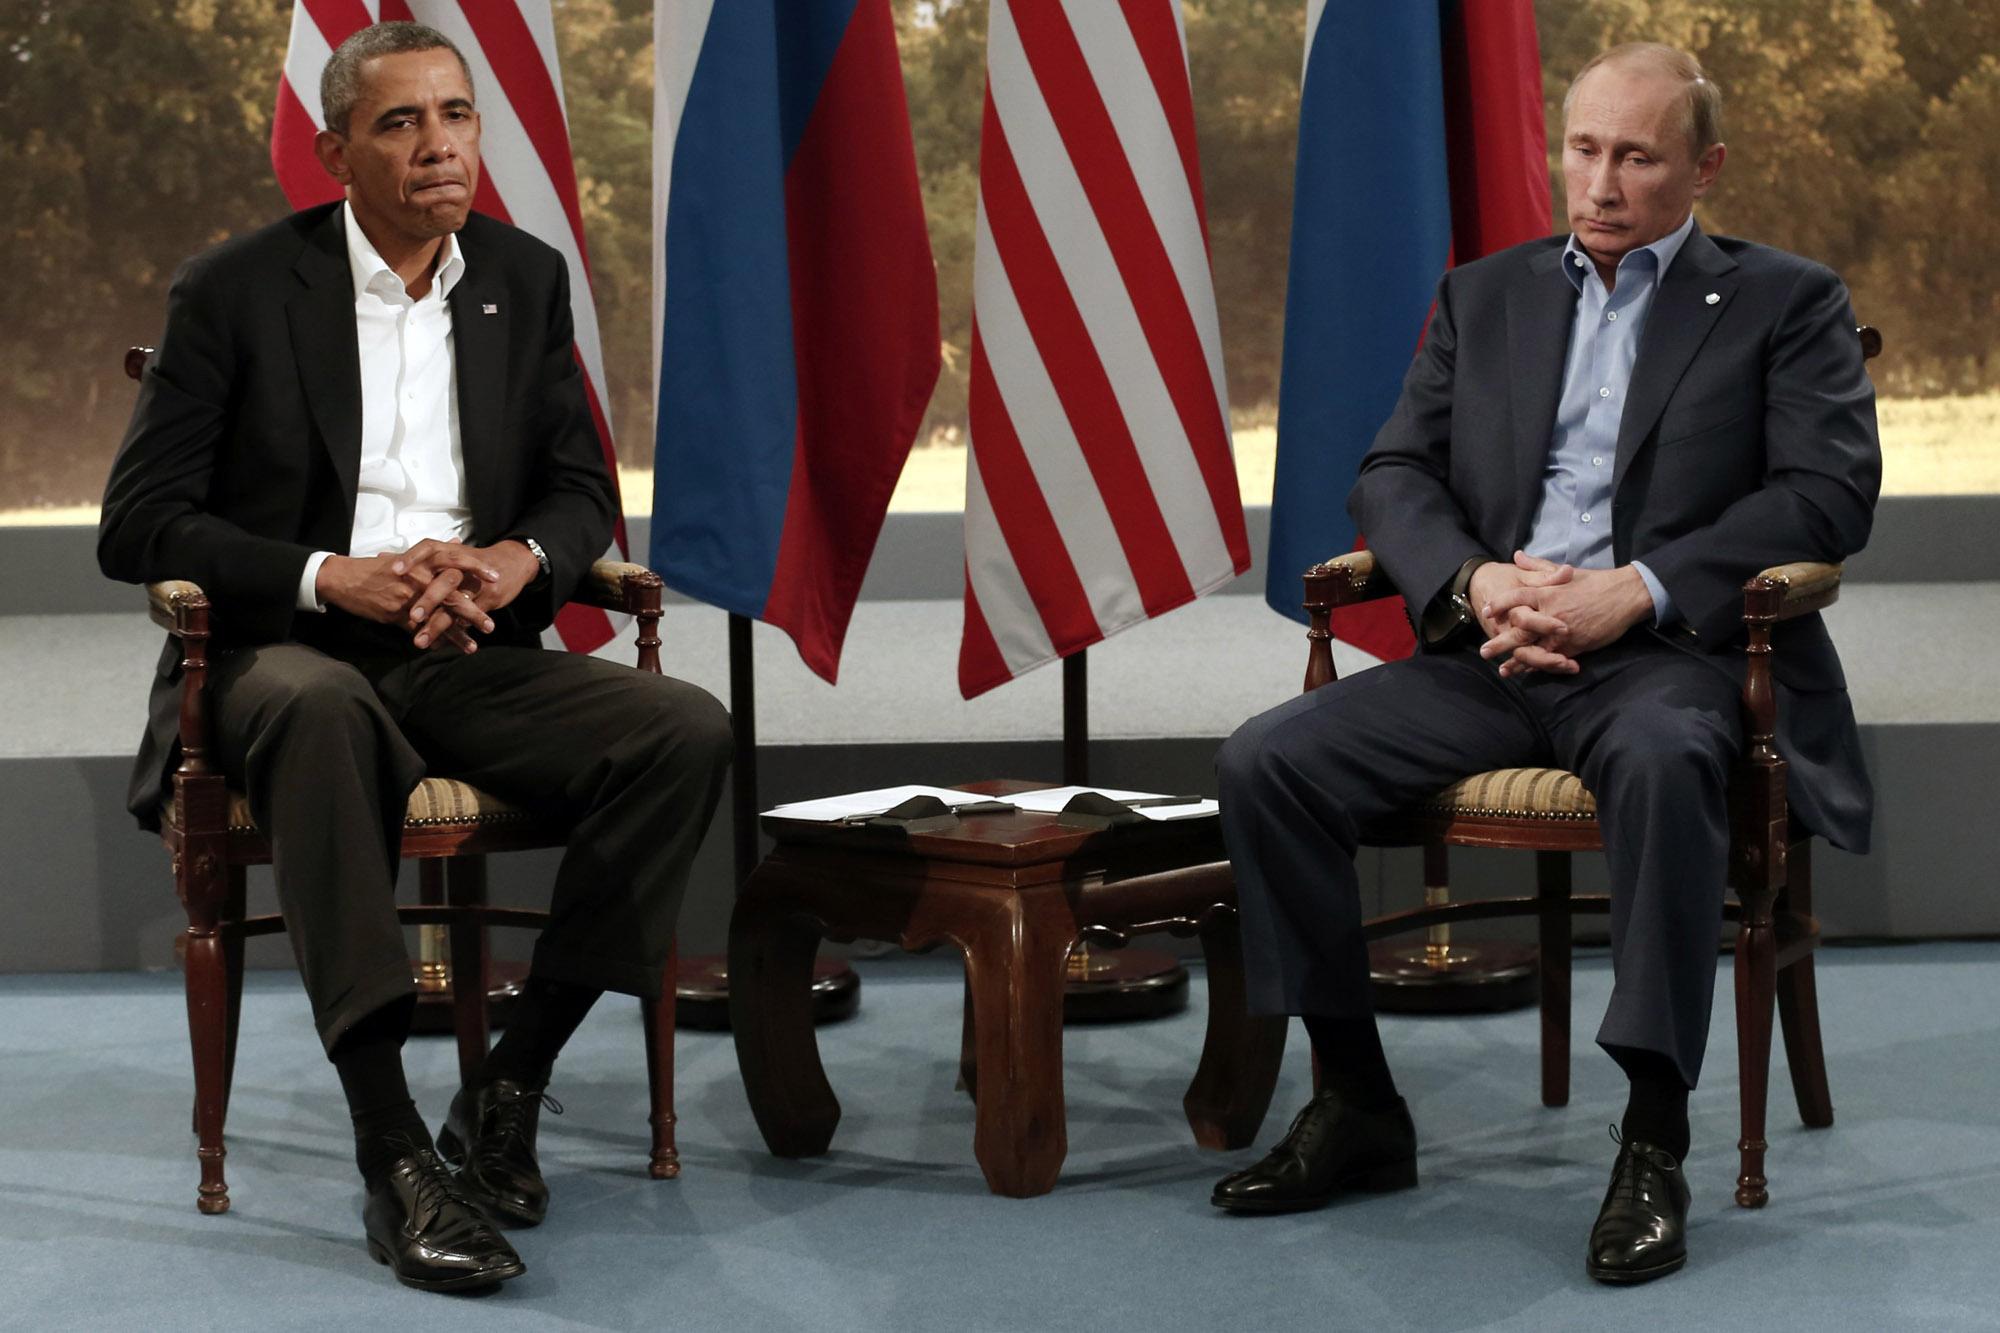 http://www.transconflict.com/wp-content/uploads/2014/04/ukraine-war-4.jpg